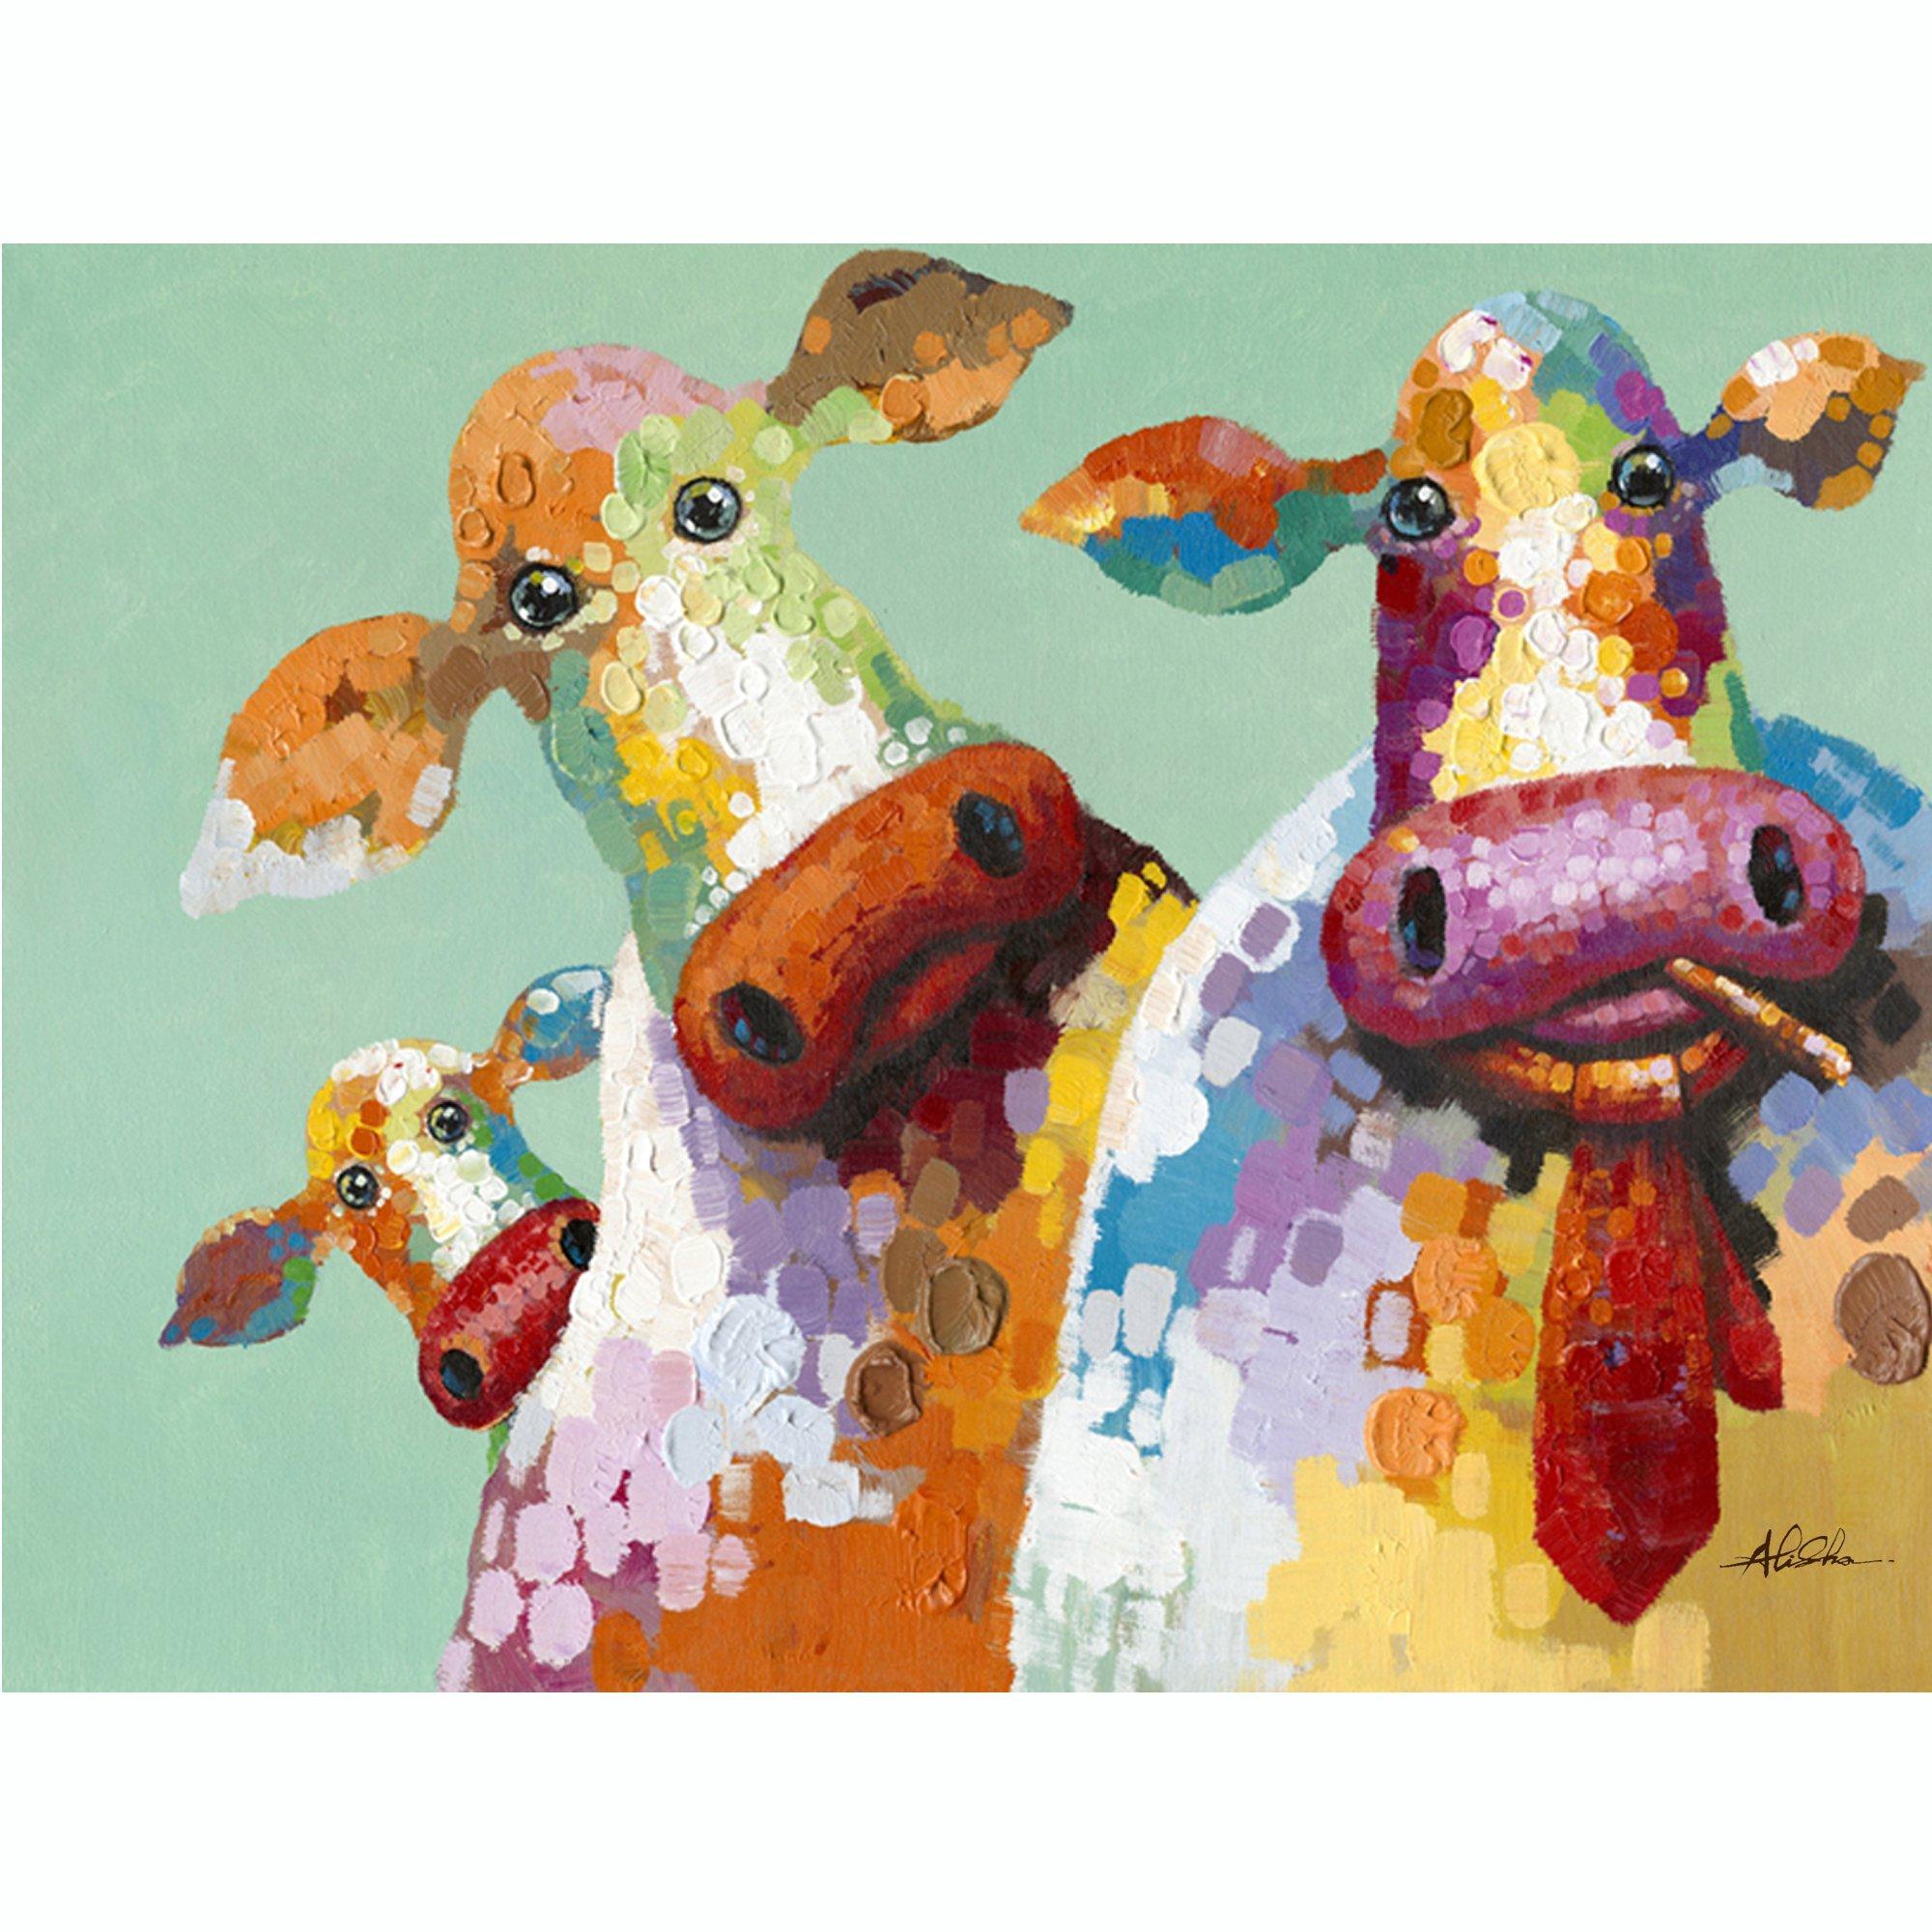 Y Decor ARTAC0583C Curious Cows Hand Painted Artwork, Large, Multicolor by Y Decor